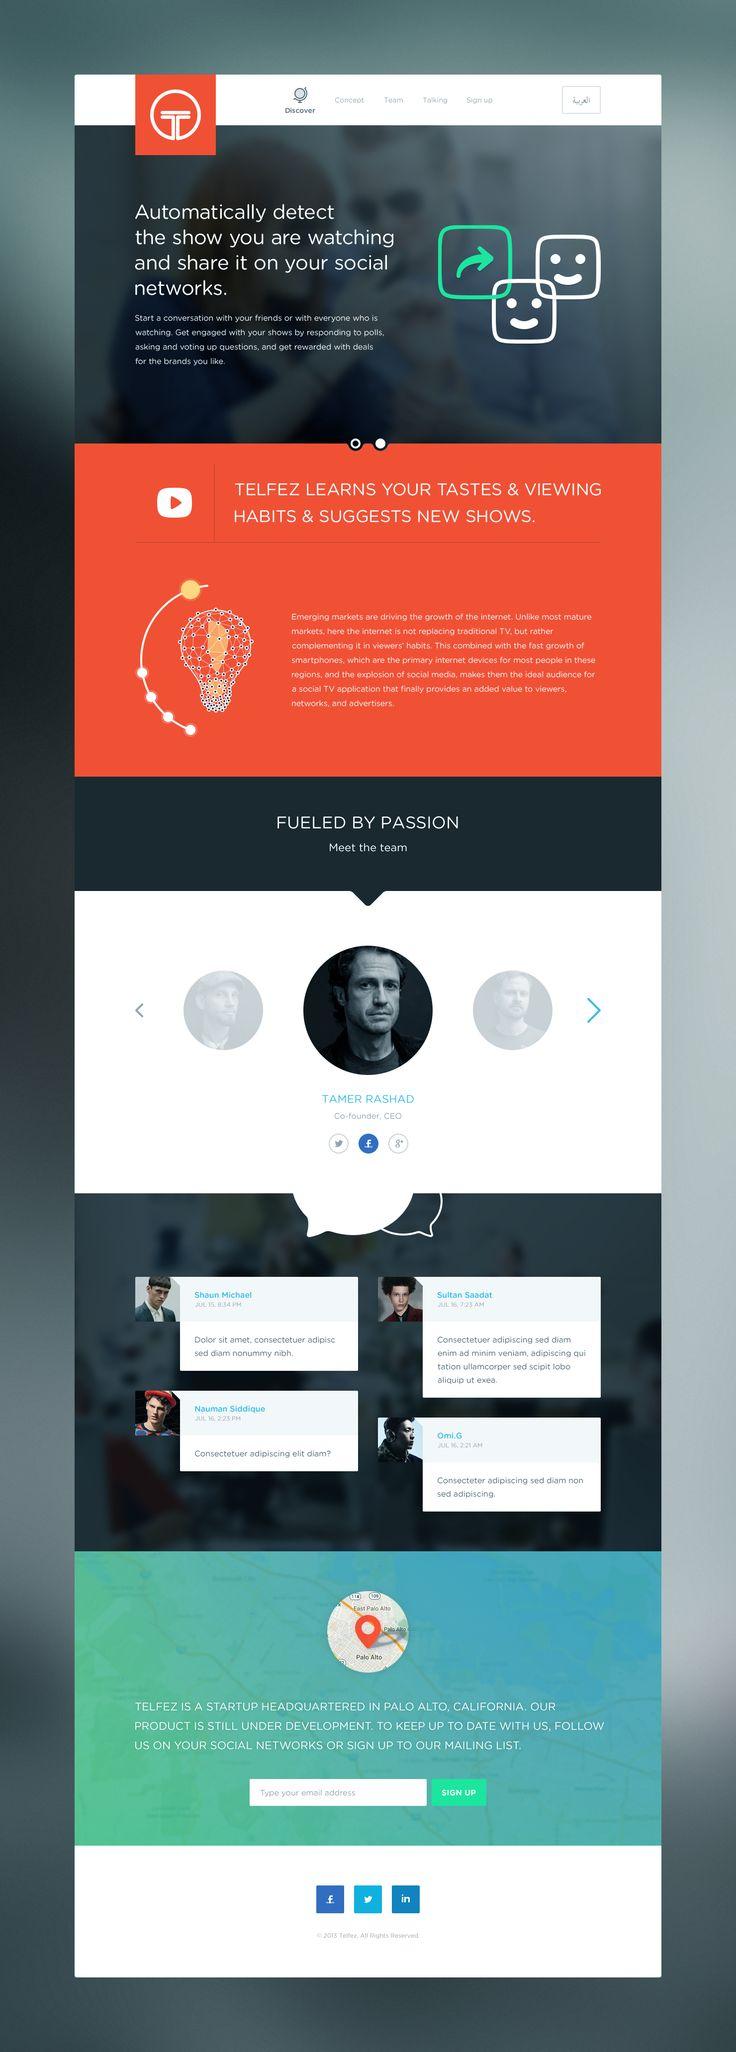 website designing company in gurgaon: http://www.netscapeindia.com